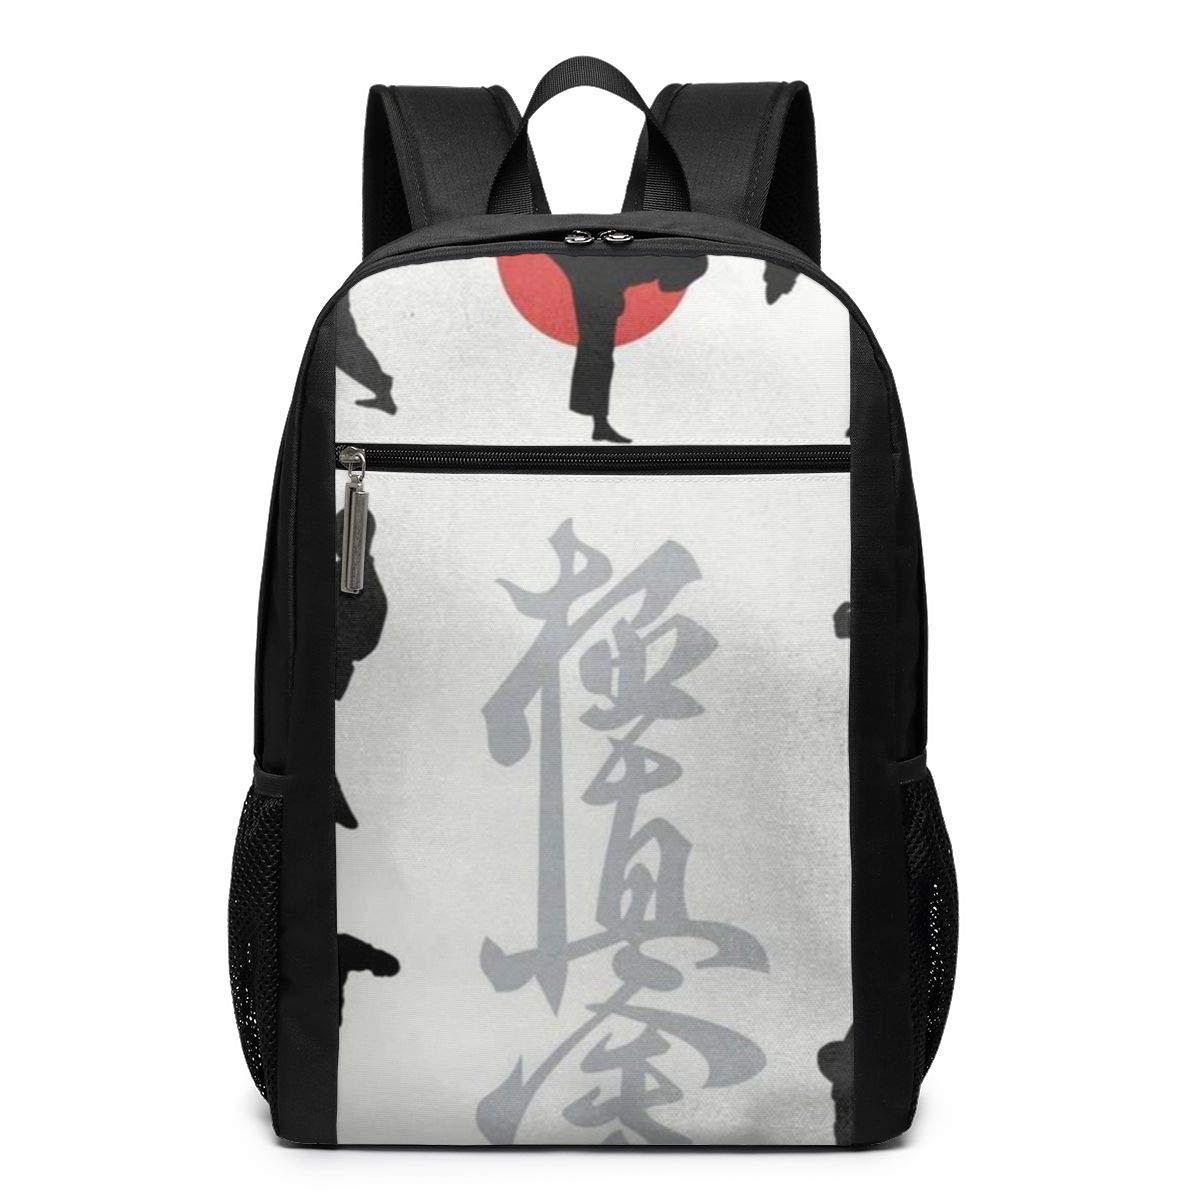 d8e091cd7bb5 Amazon.com: Japan Karate Travel Laptop Backpack, Anti Theft Backpack ...